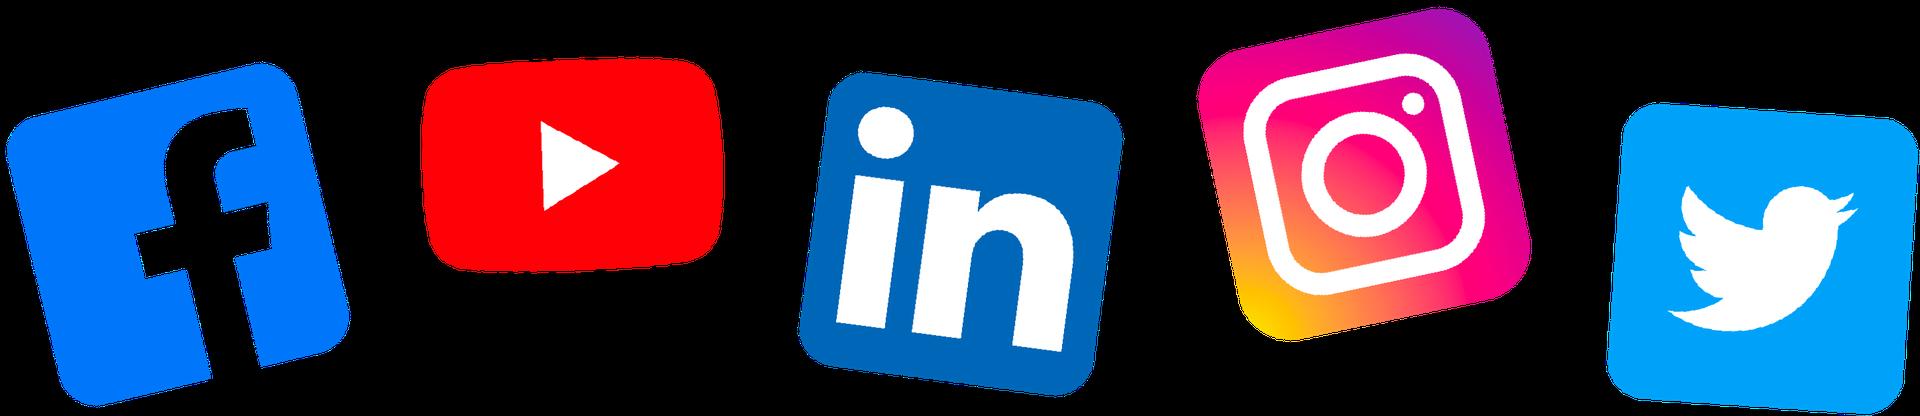 Social Media Icons Image